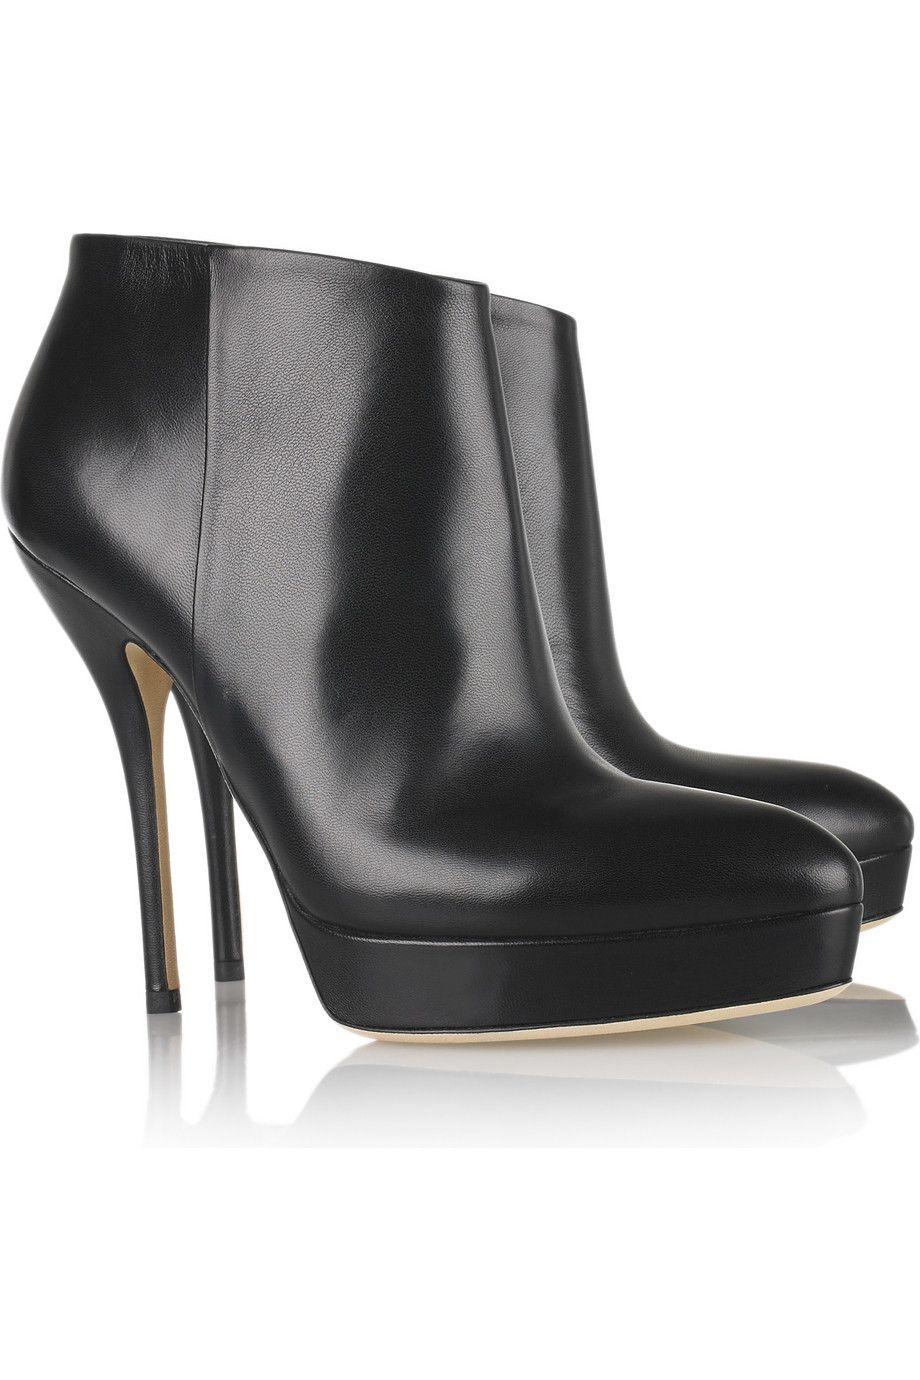 Pin de Julie Schalk em Gucci  3   Pinterest   Bota, Calçado feminino ... a50df36d47